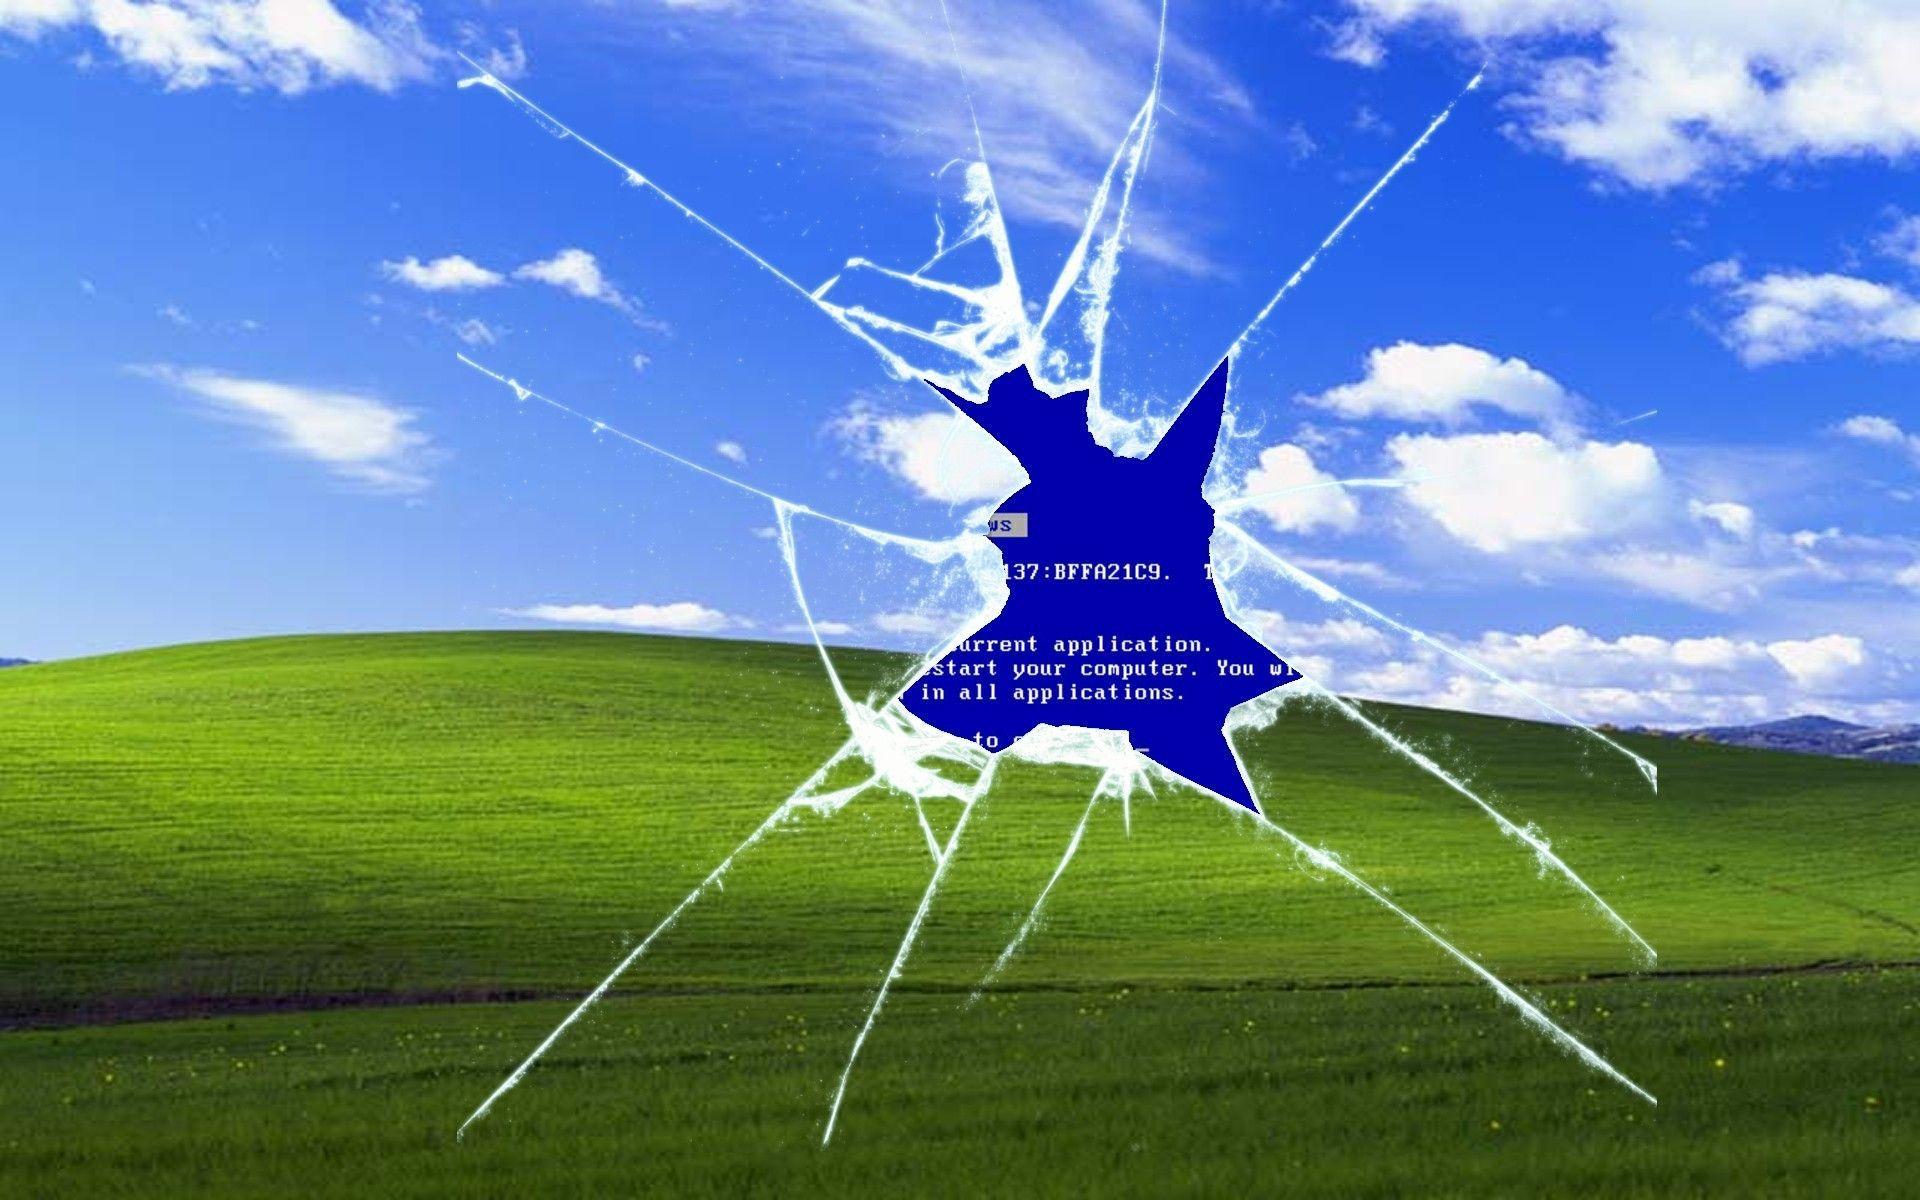 Windows XP Wallpapers Bliss Wallpaper 1920×1200 Windows